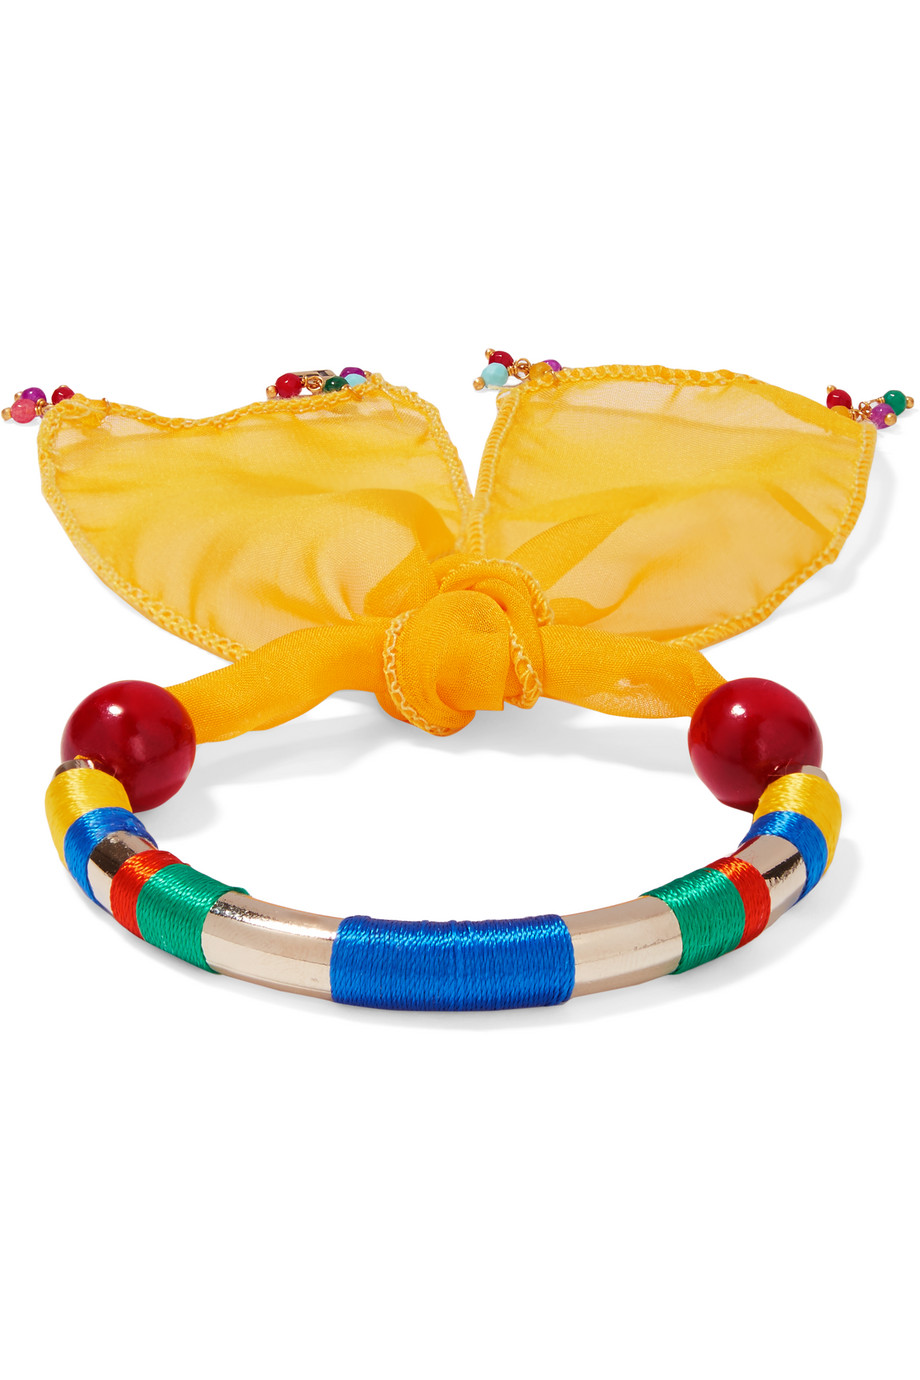 Rosantica Yucatan Gold-Tone, Quartz, Silk-Chiffon and Wood Bracelet, Gold/Yellow, Women's